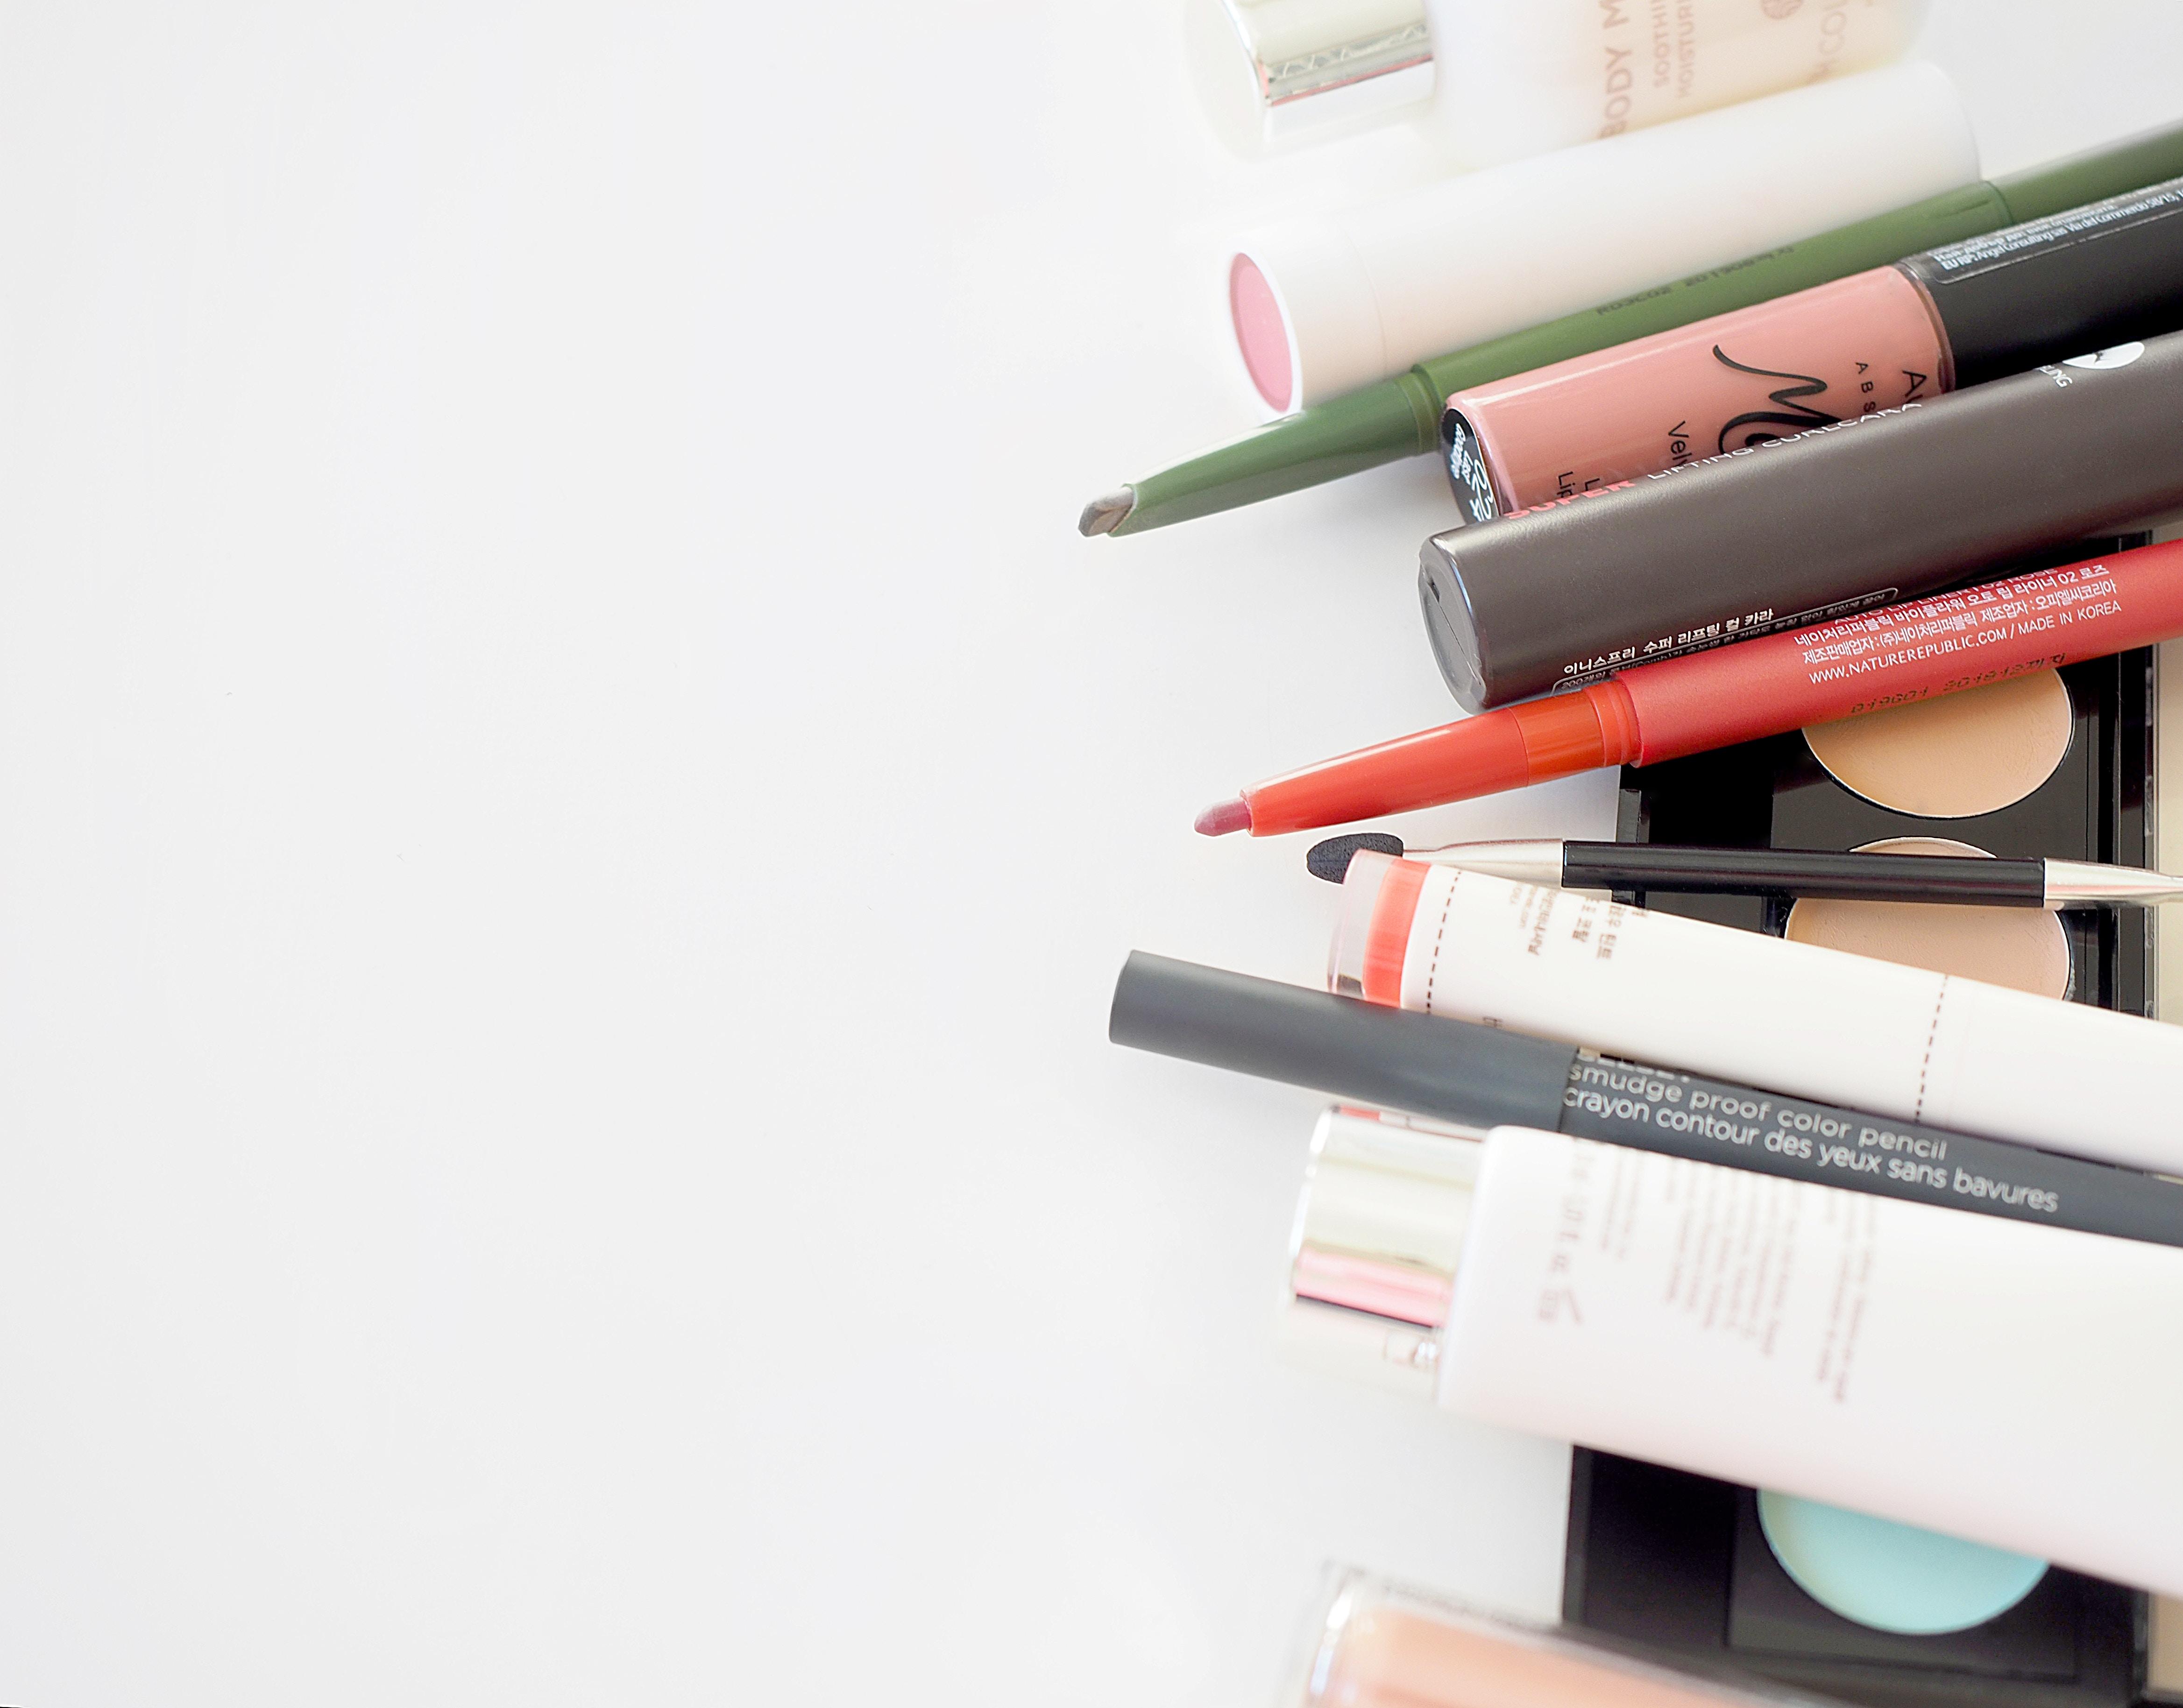 Viele Naturskosmetiklabel versuchen auf Alternativen zu Plastik umzusteigen. -Photocredit:  Diana Kadreva/Unsplash